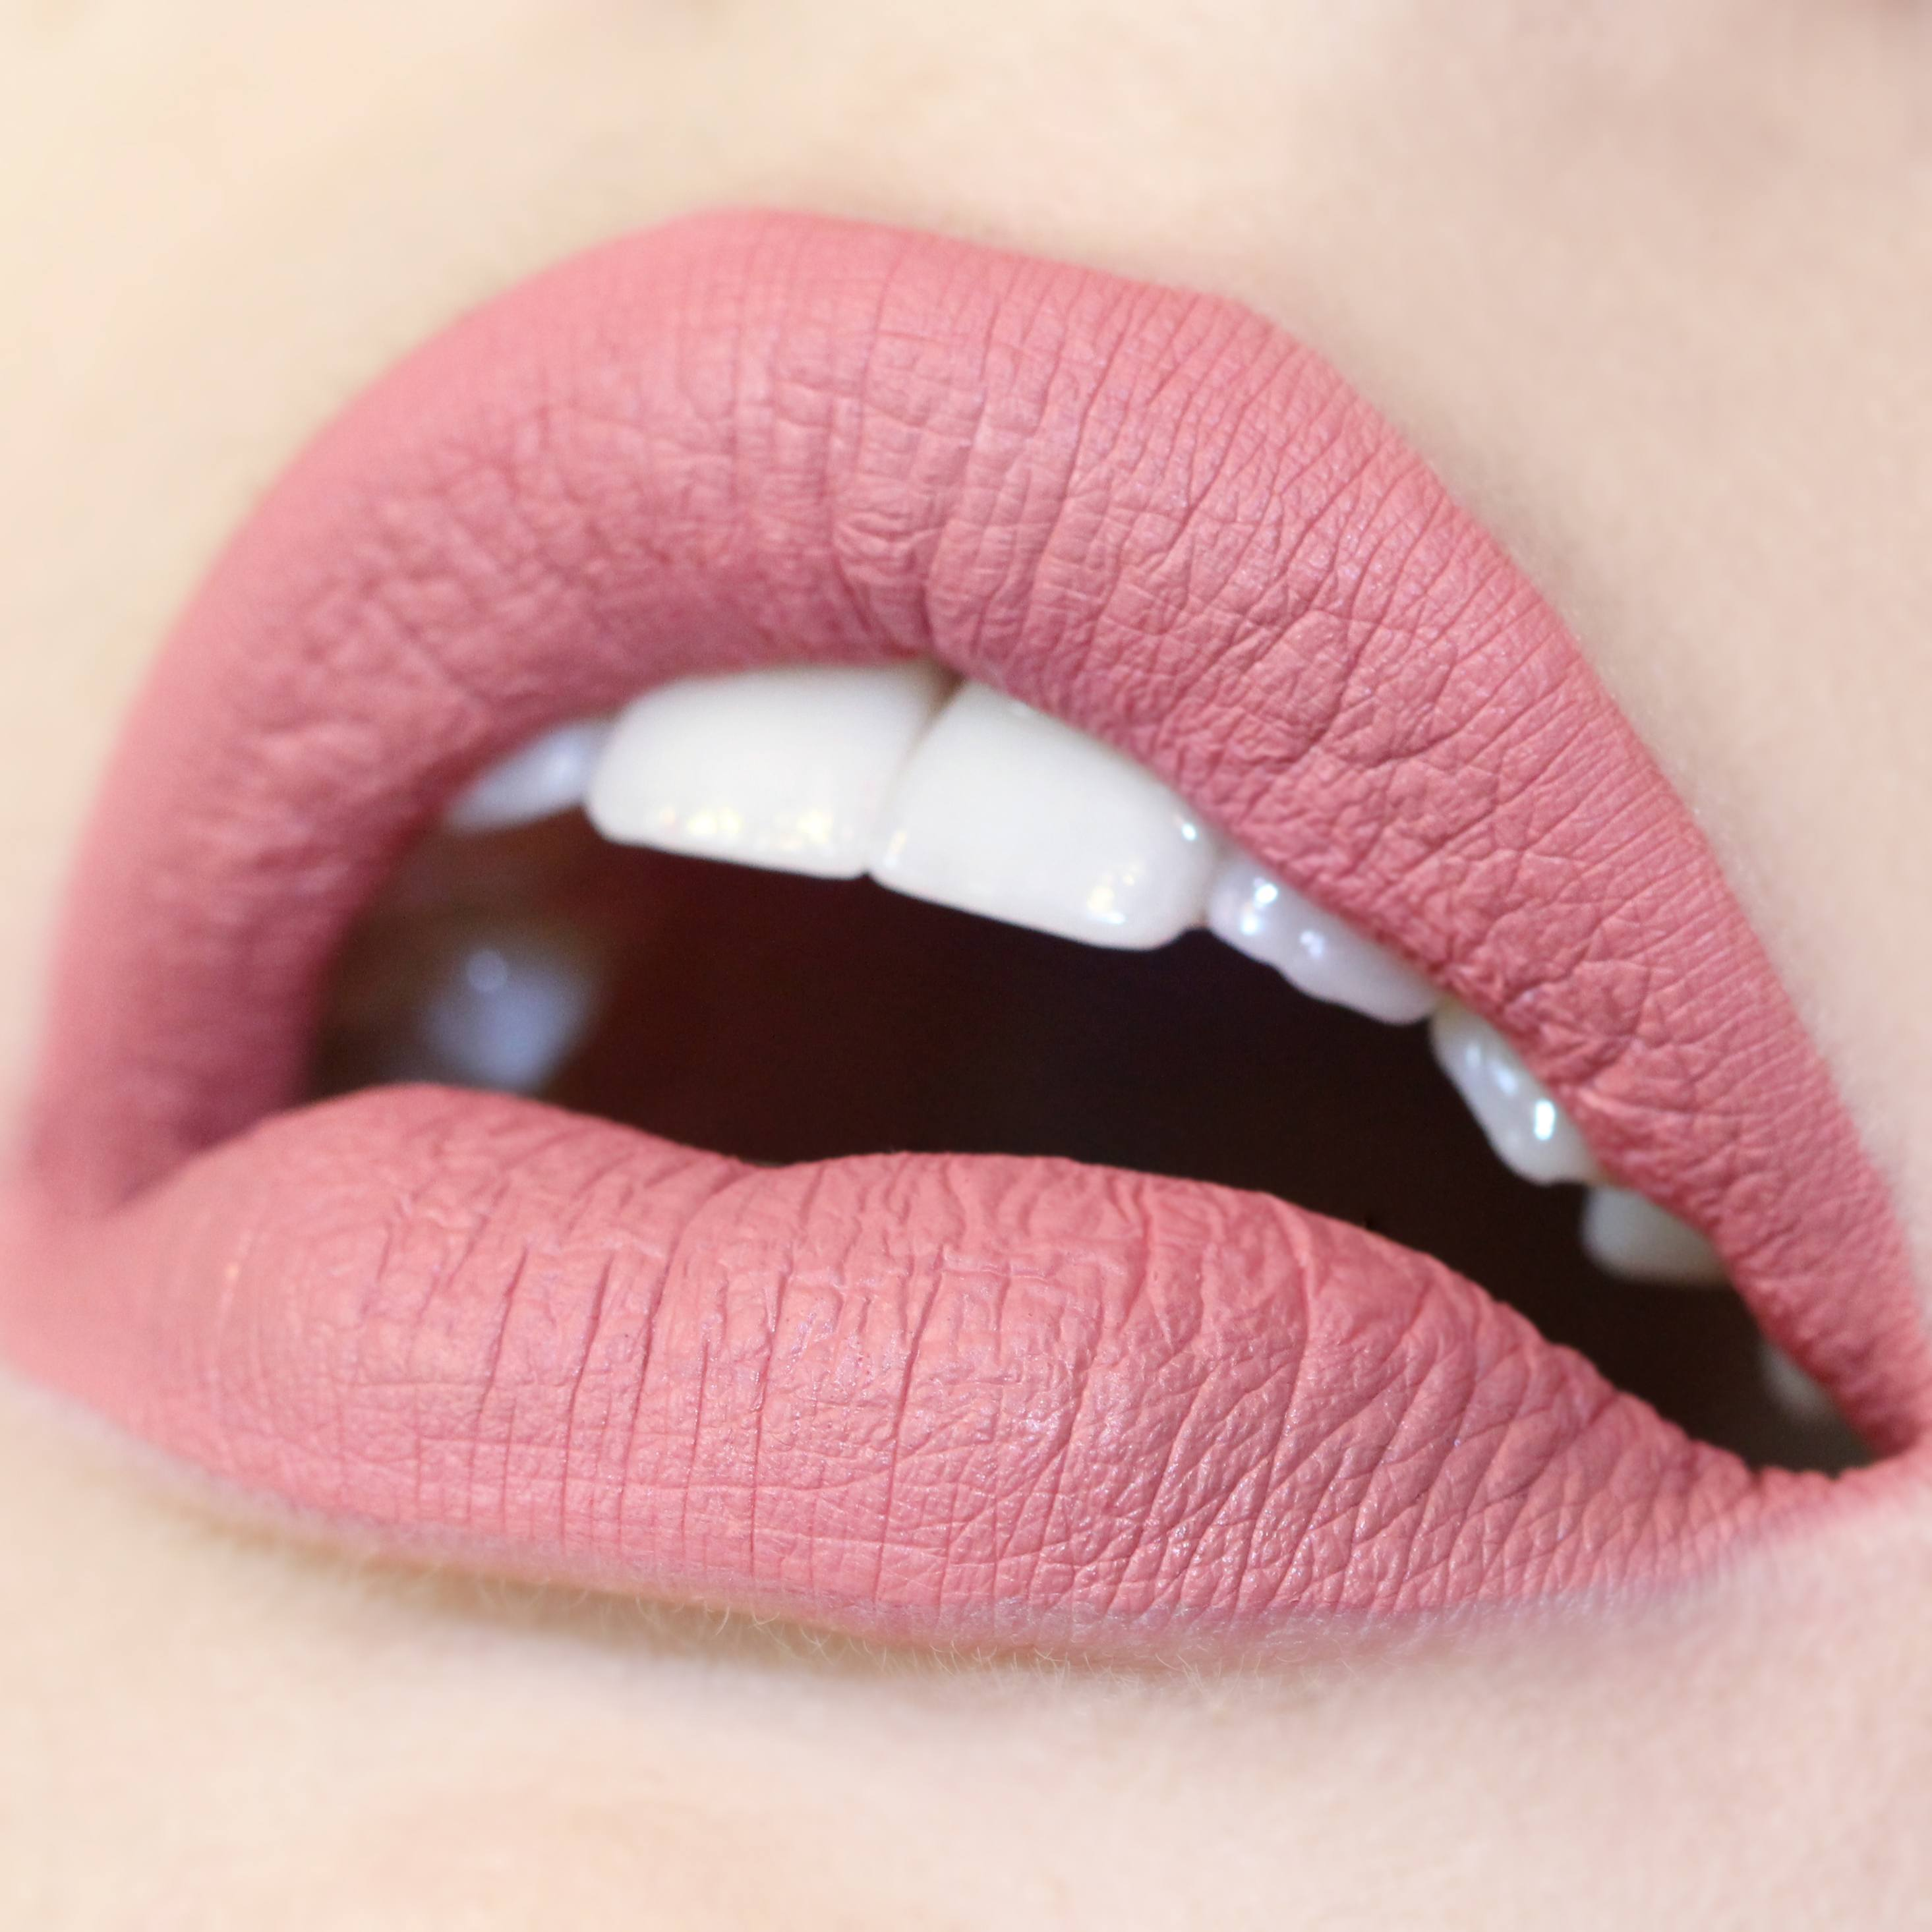 colourpop ultra matte lip สี solow